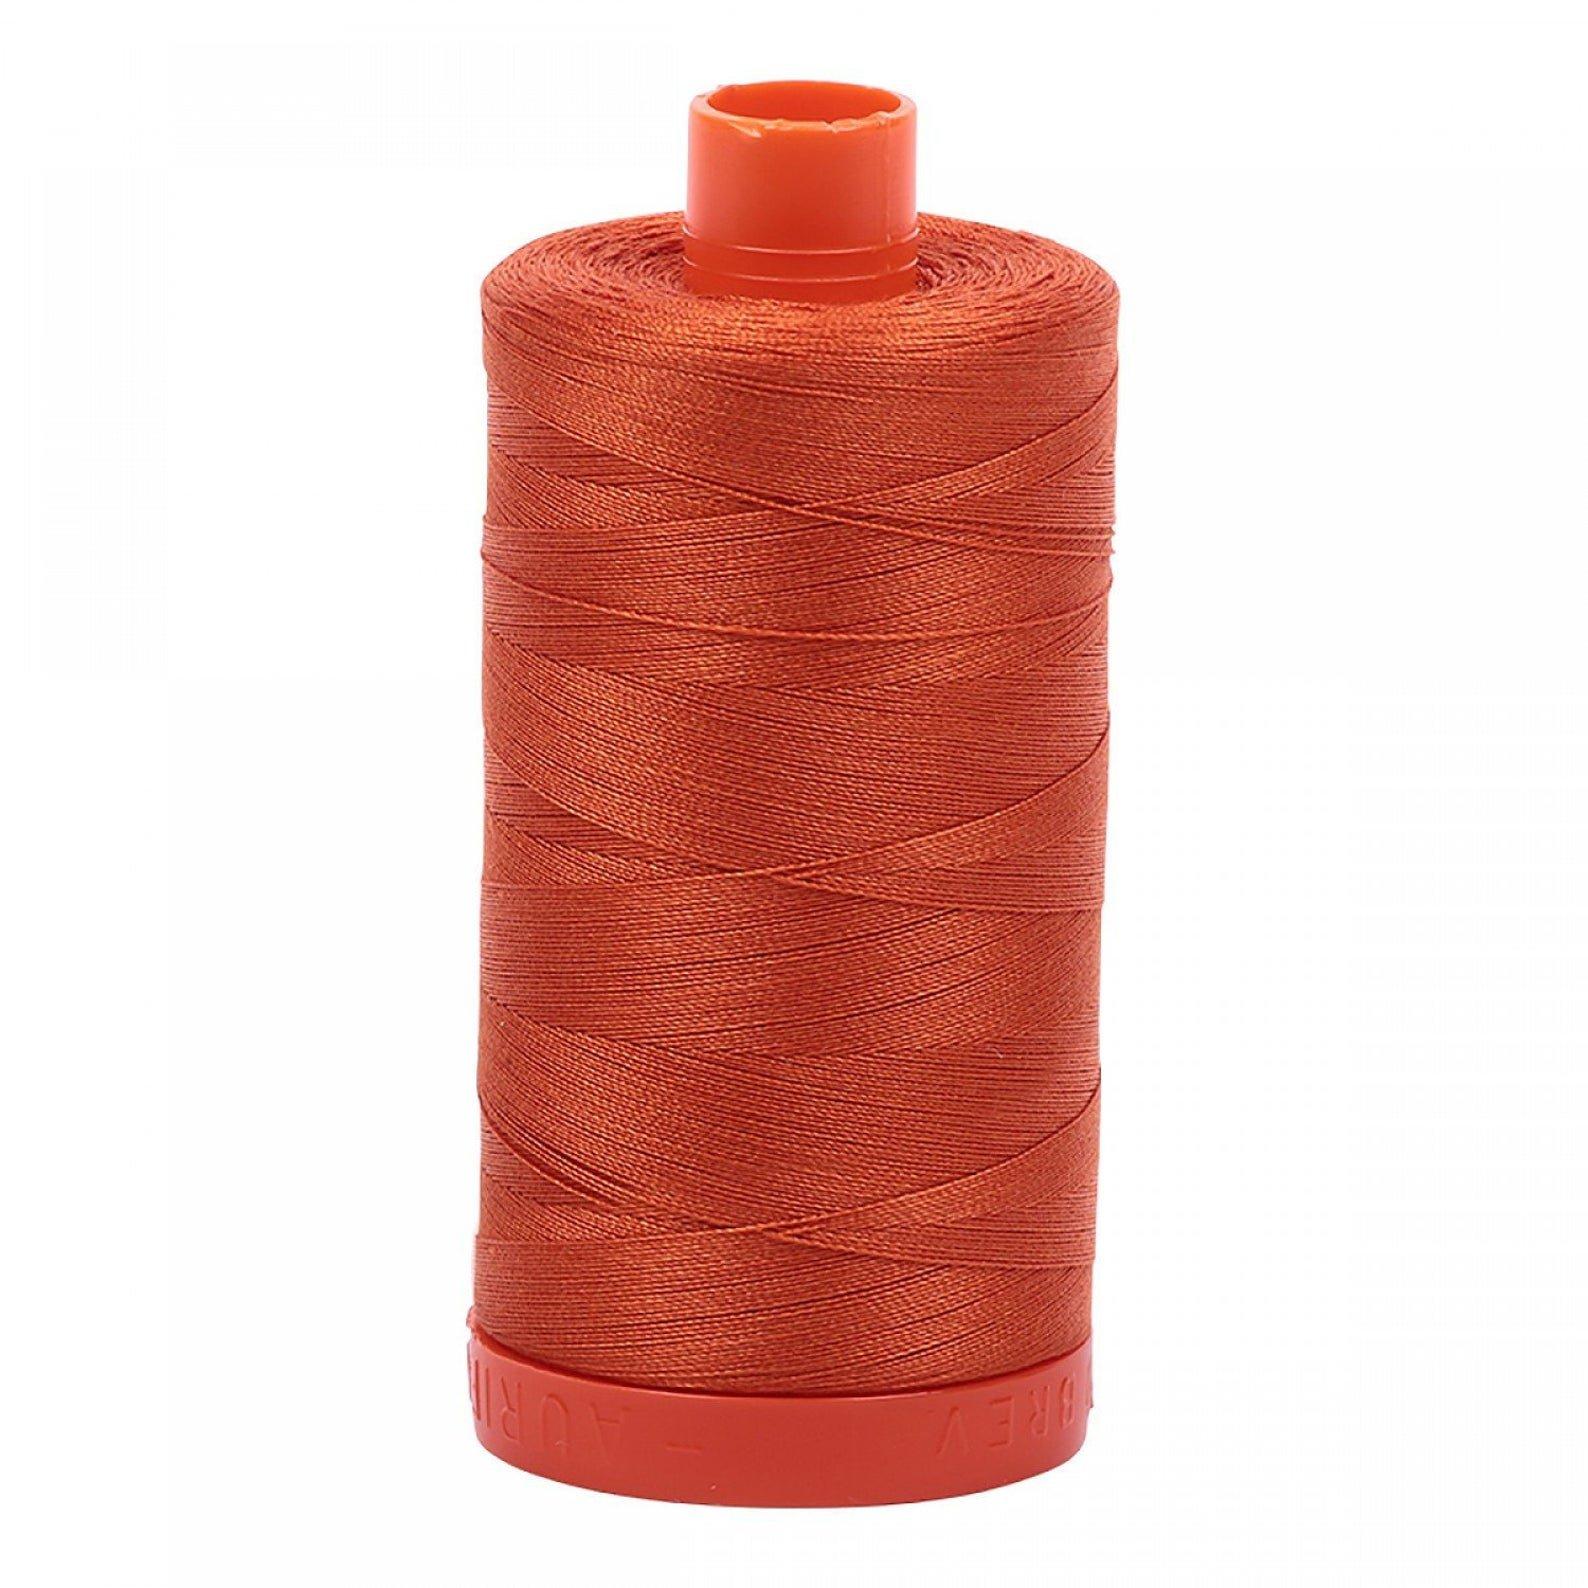 Aurifil 2240 Rusty Orange